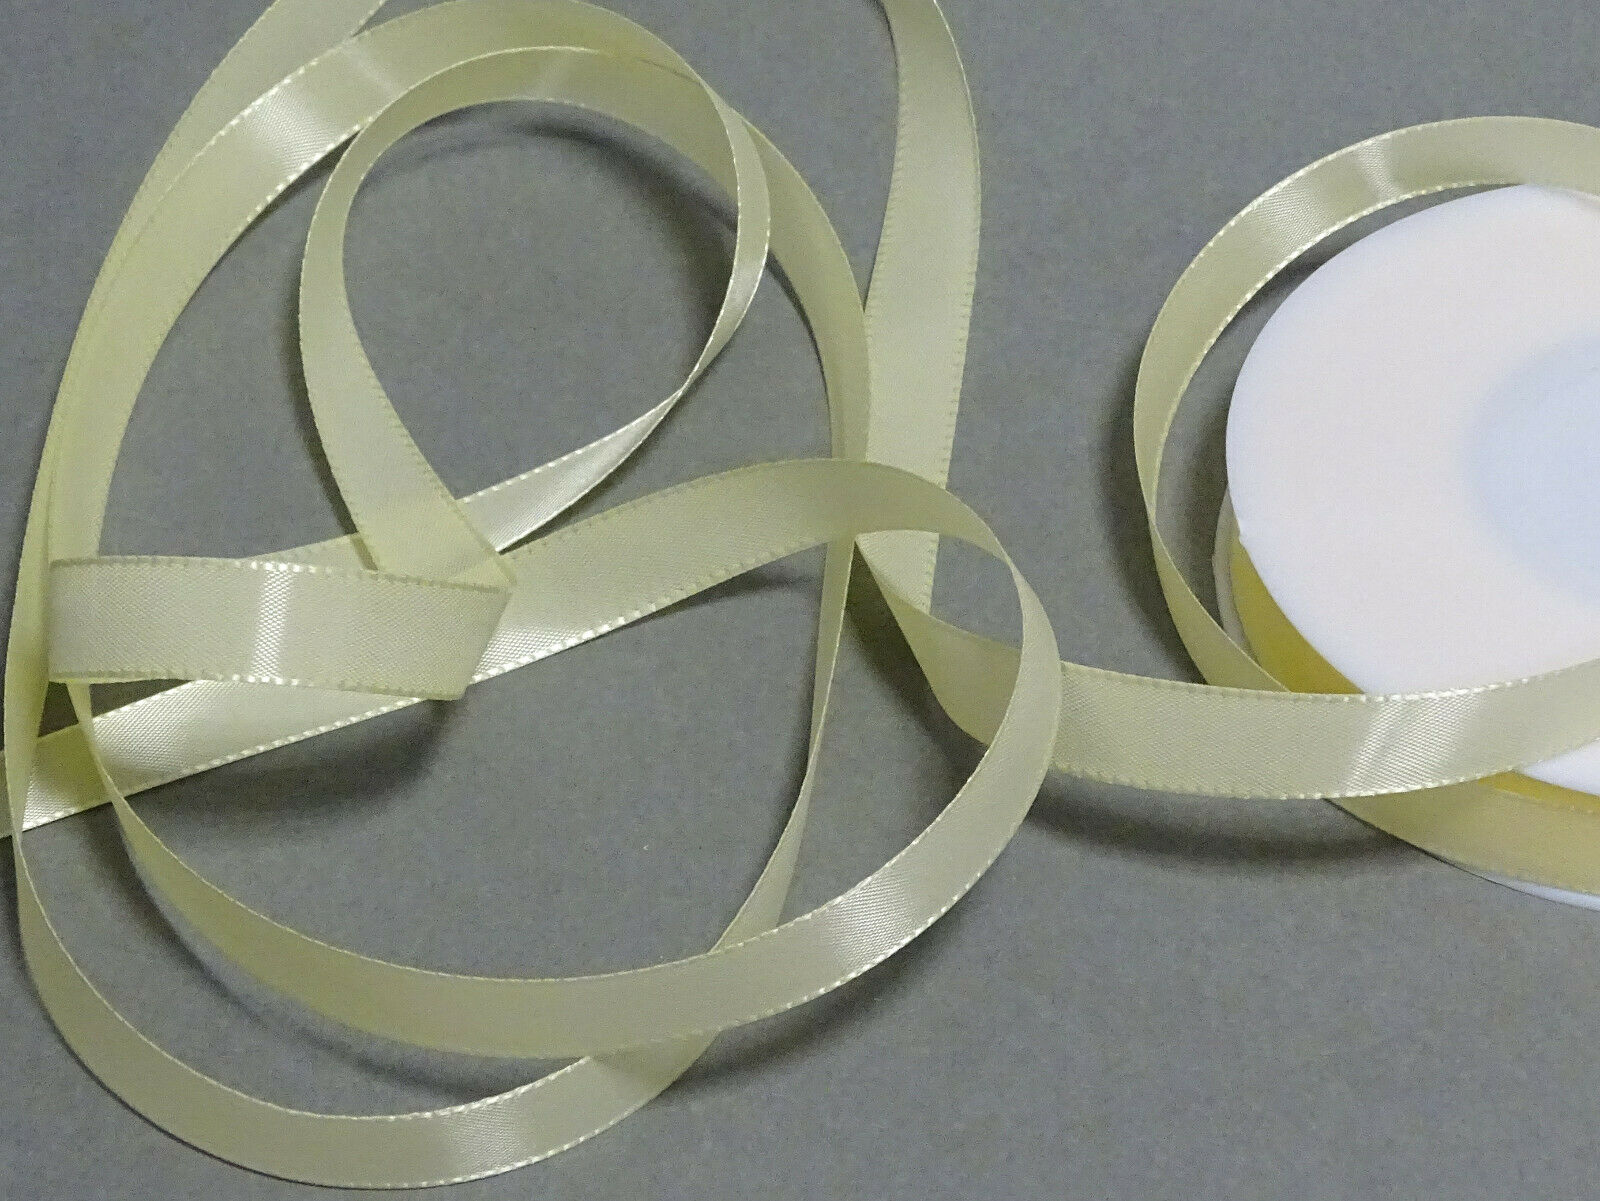 Seidenband Schleifenband 50 m x 15 / 25 / 40mm Dekoband ab 0,08€/m Geschenkband  - Creme 105, 15 mm x 50 m